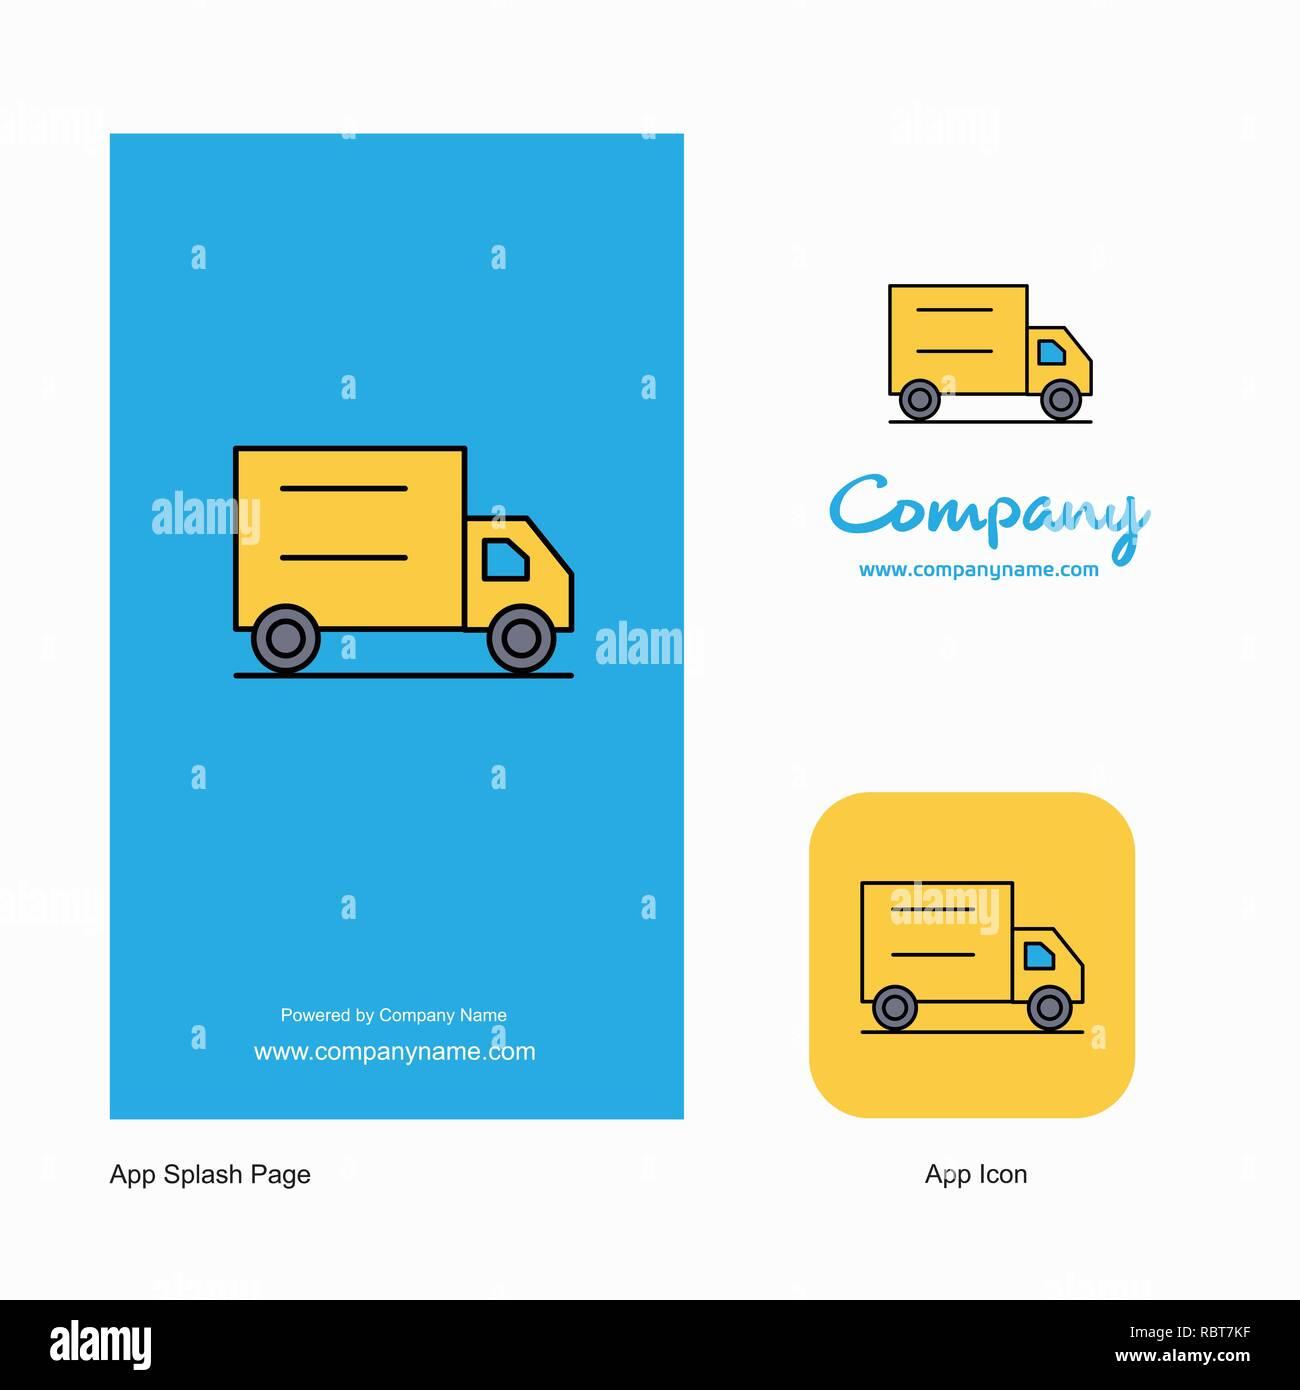 Truck Company Logo App Icon and Splash Page Design  Creative